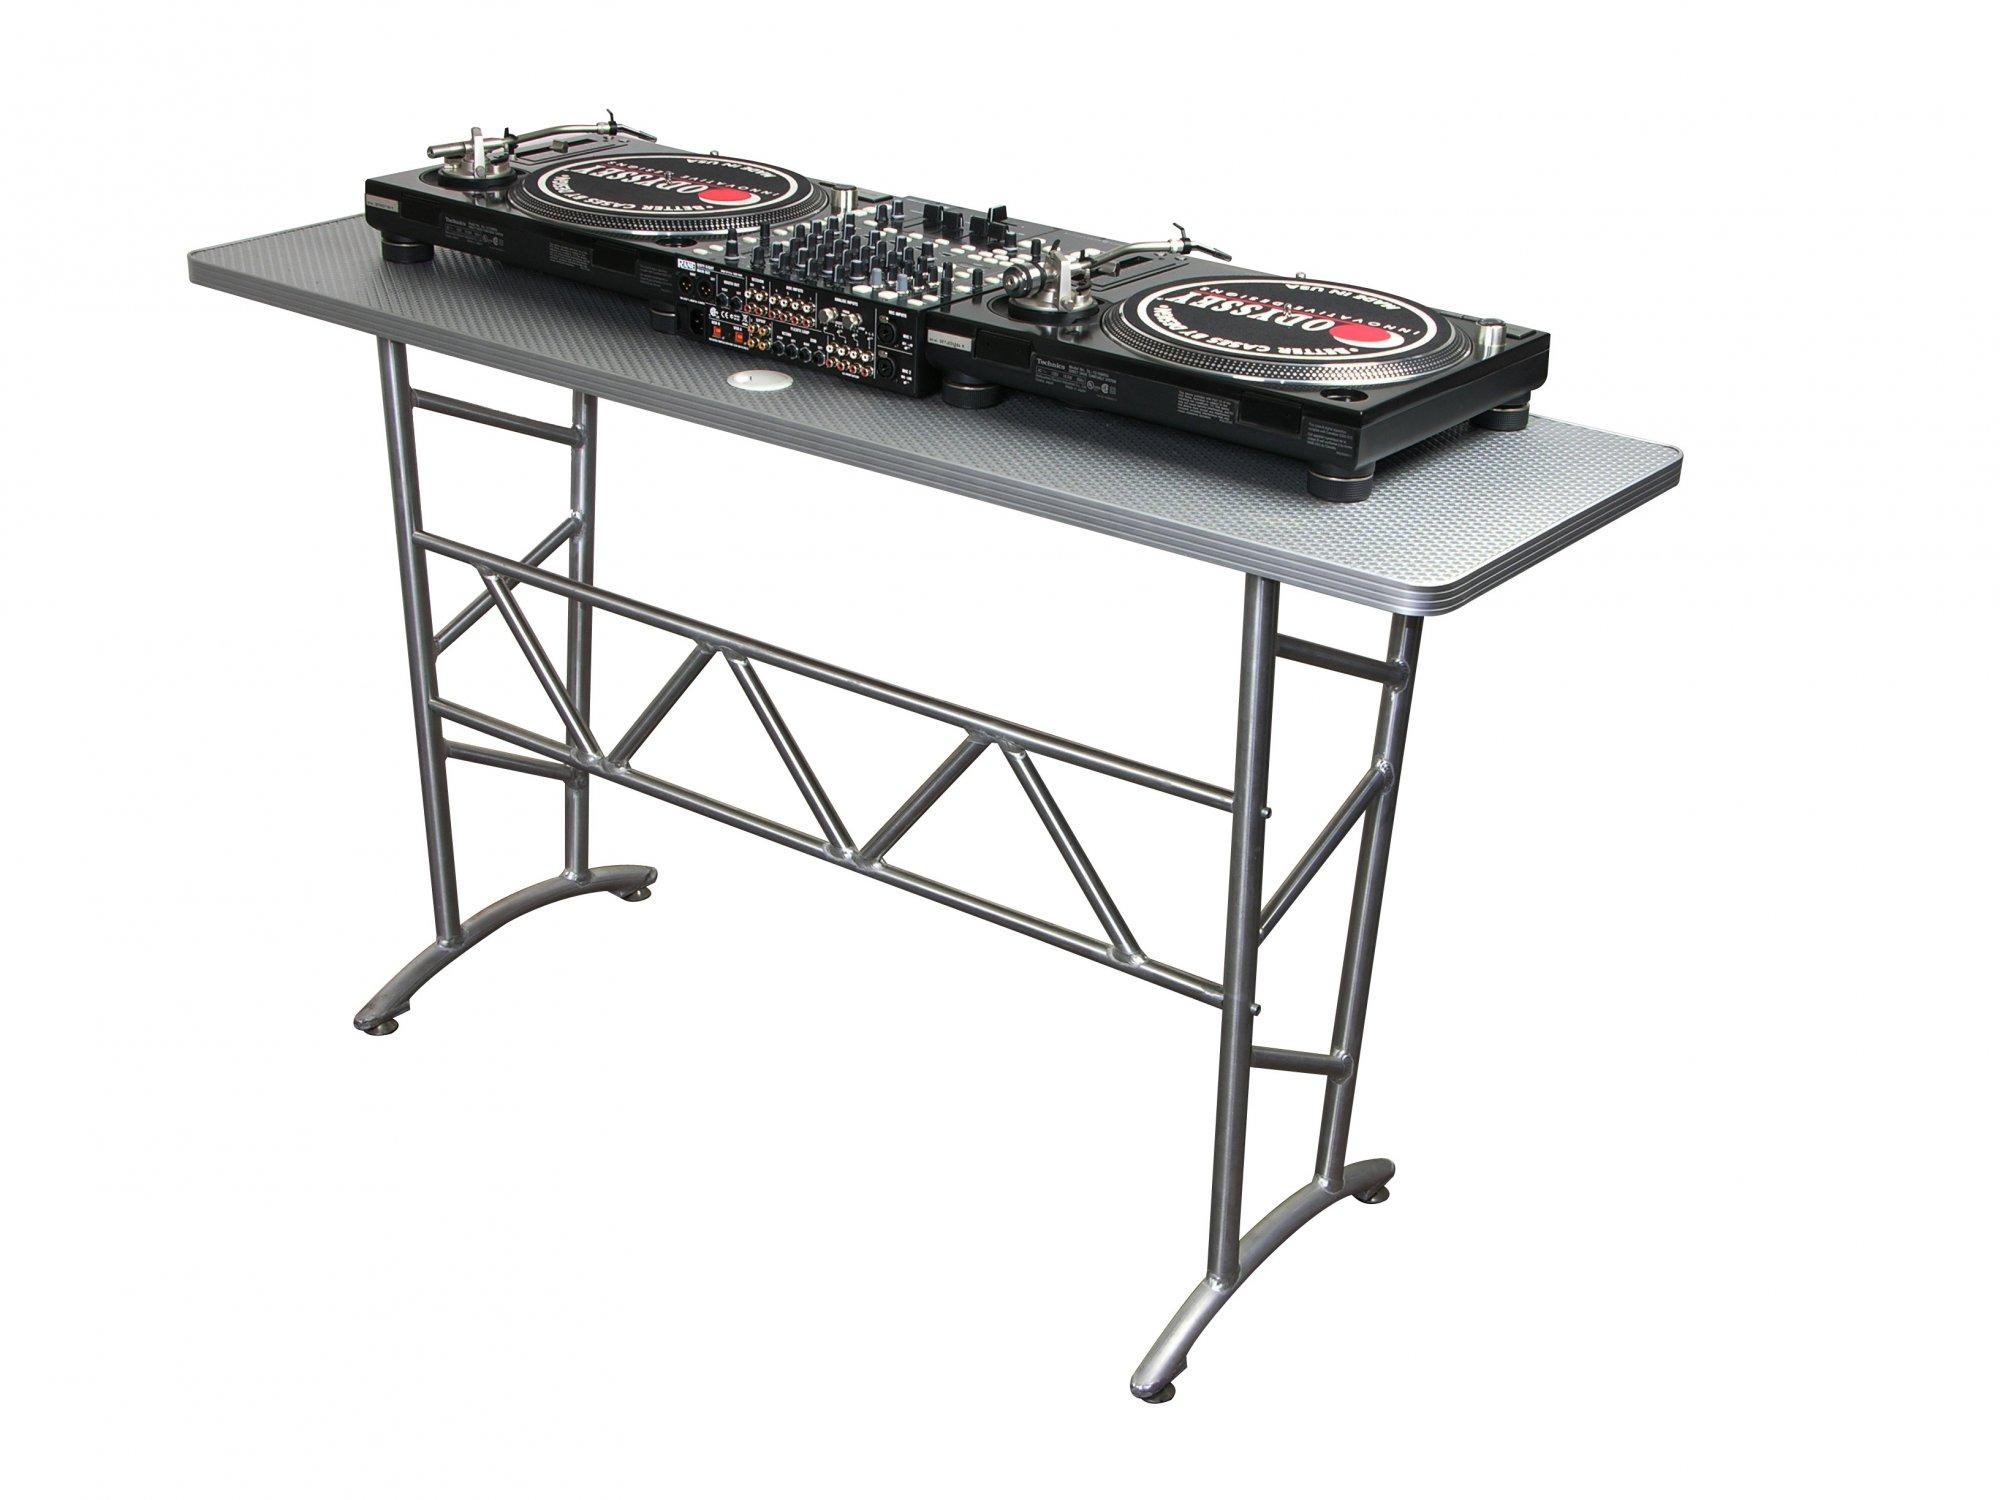 Odyssey Case ATT - Truss Table, Heavy Duty Aluminum